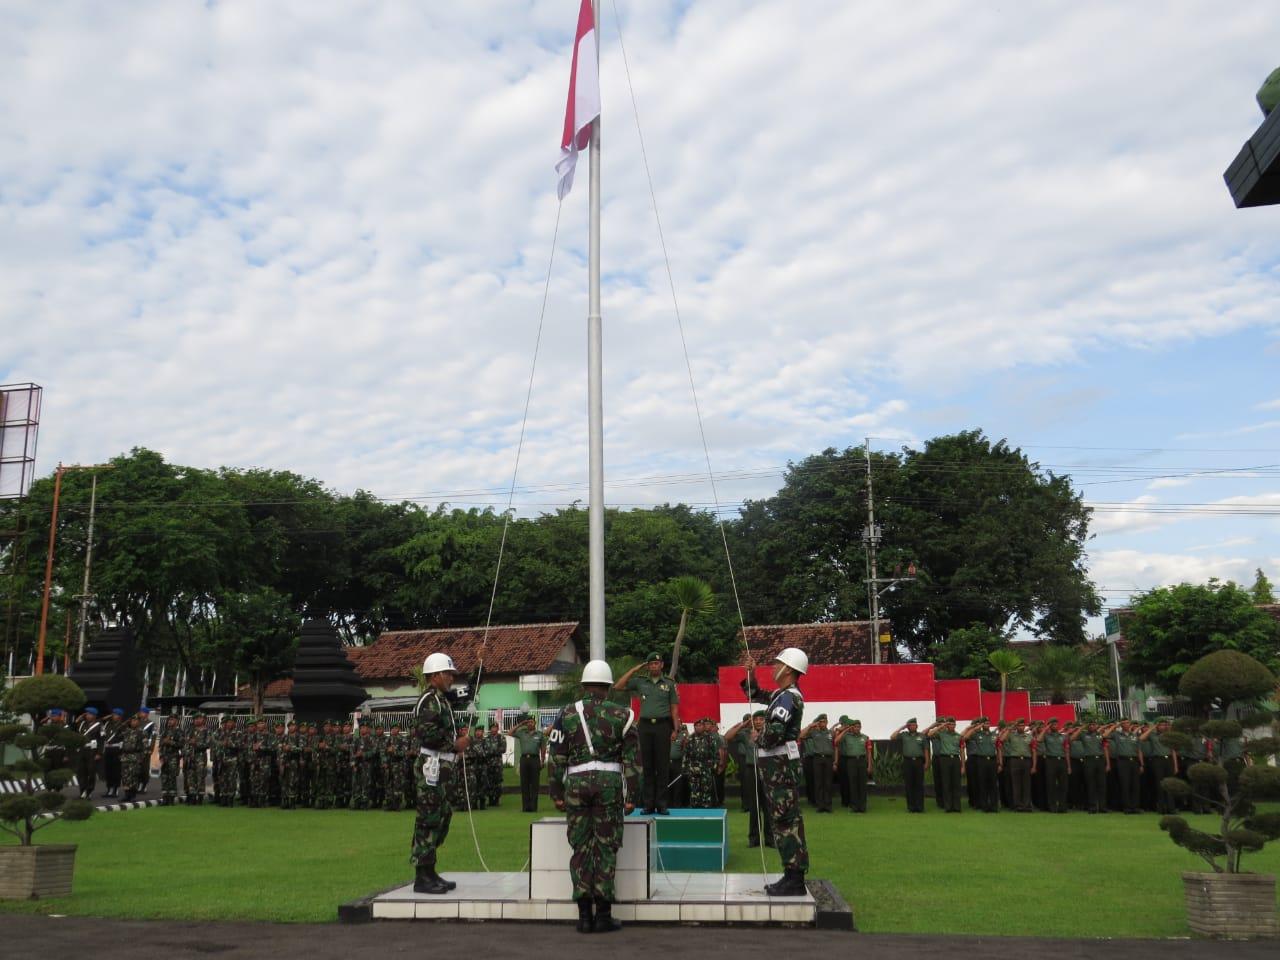 Upacara Bendera 17an Rutinitas Yang di Gelar Kodim 0825 Banyuwangi